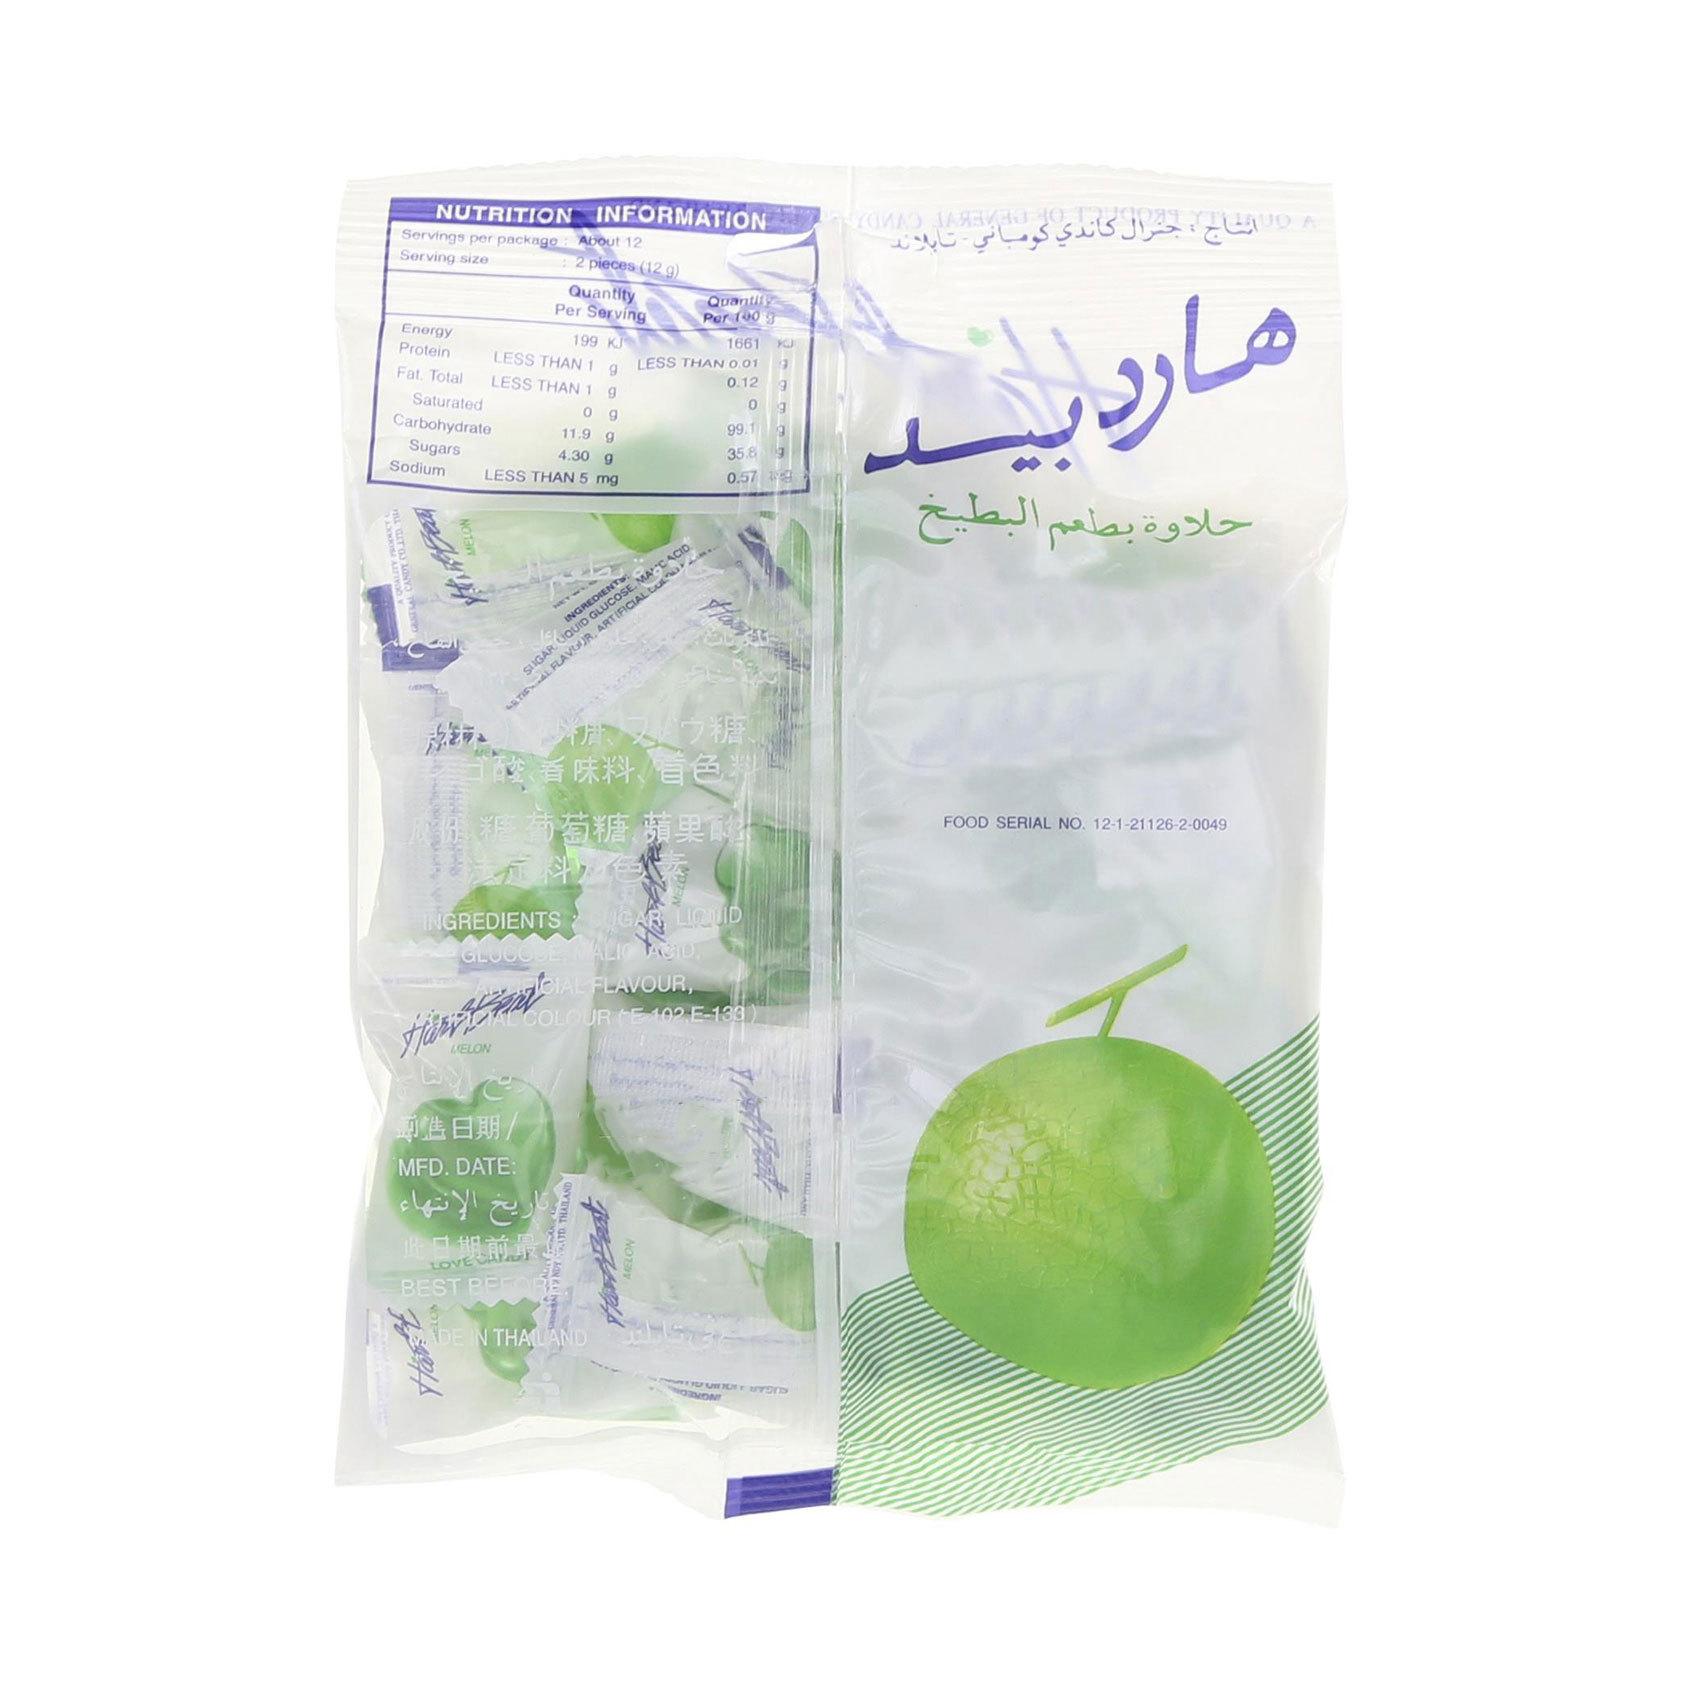 HARTBEAT MELON SWEET CAN 150GR